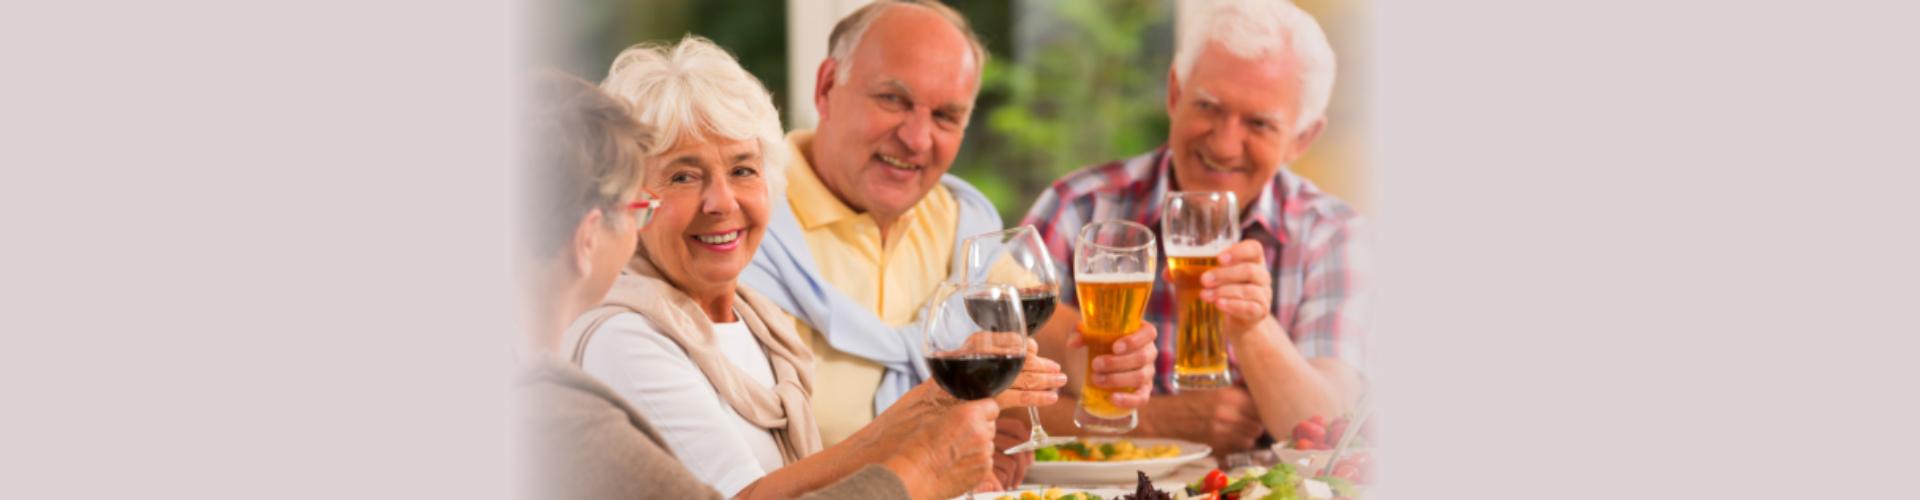 Happy senior friends drinking beer.